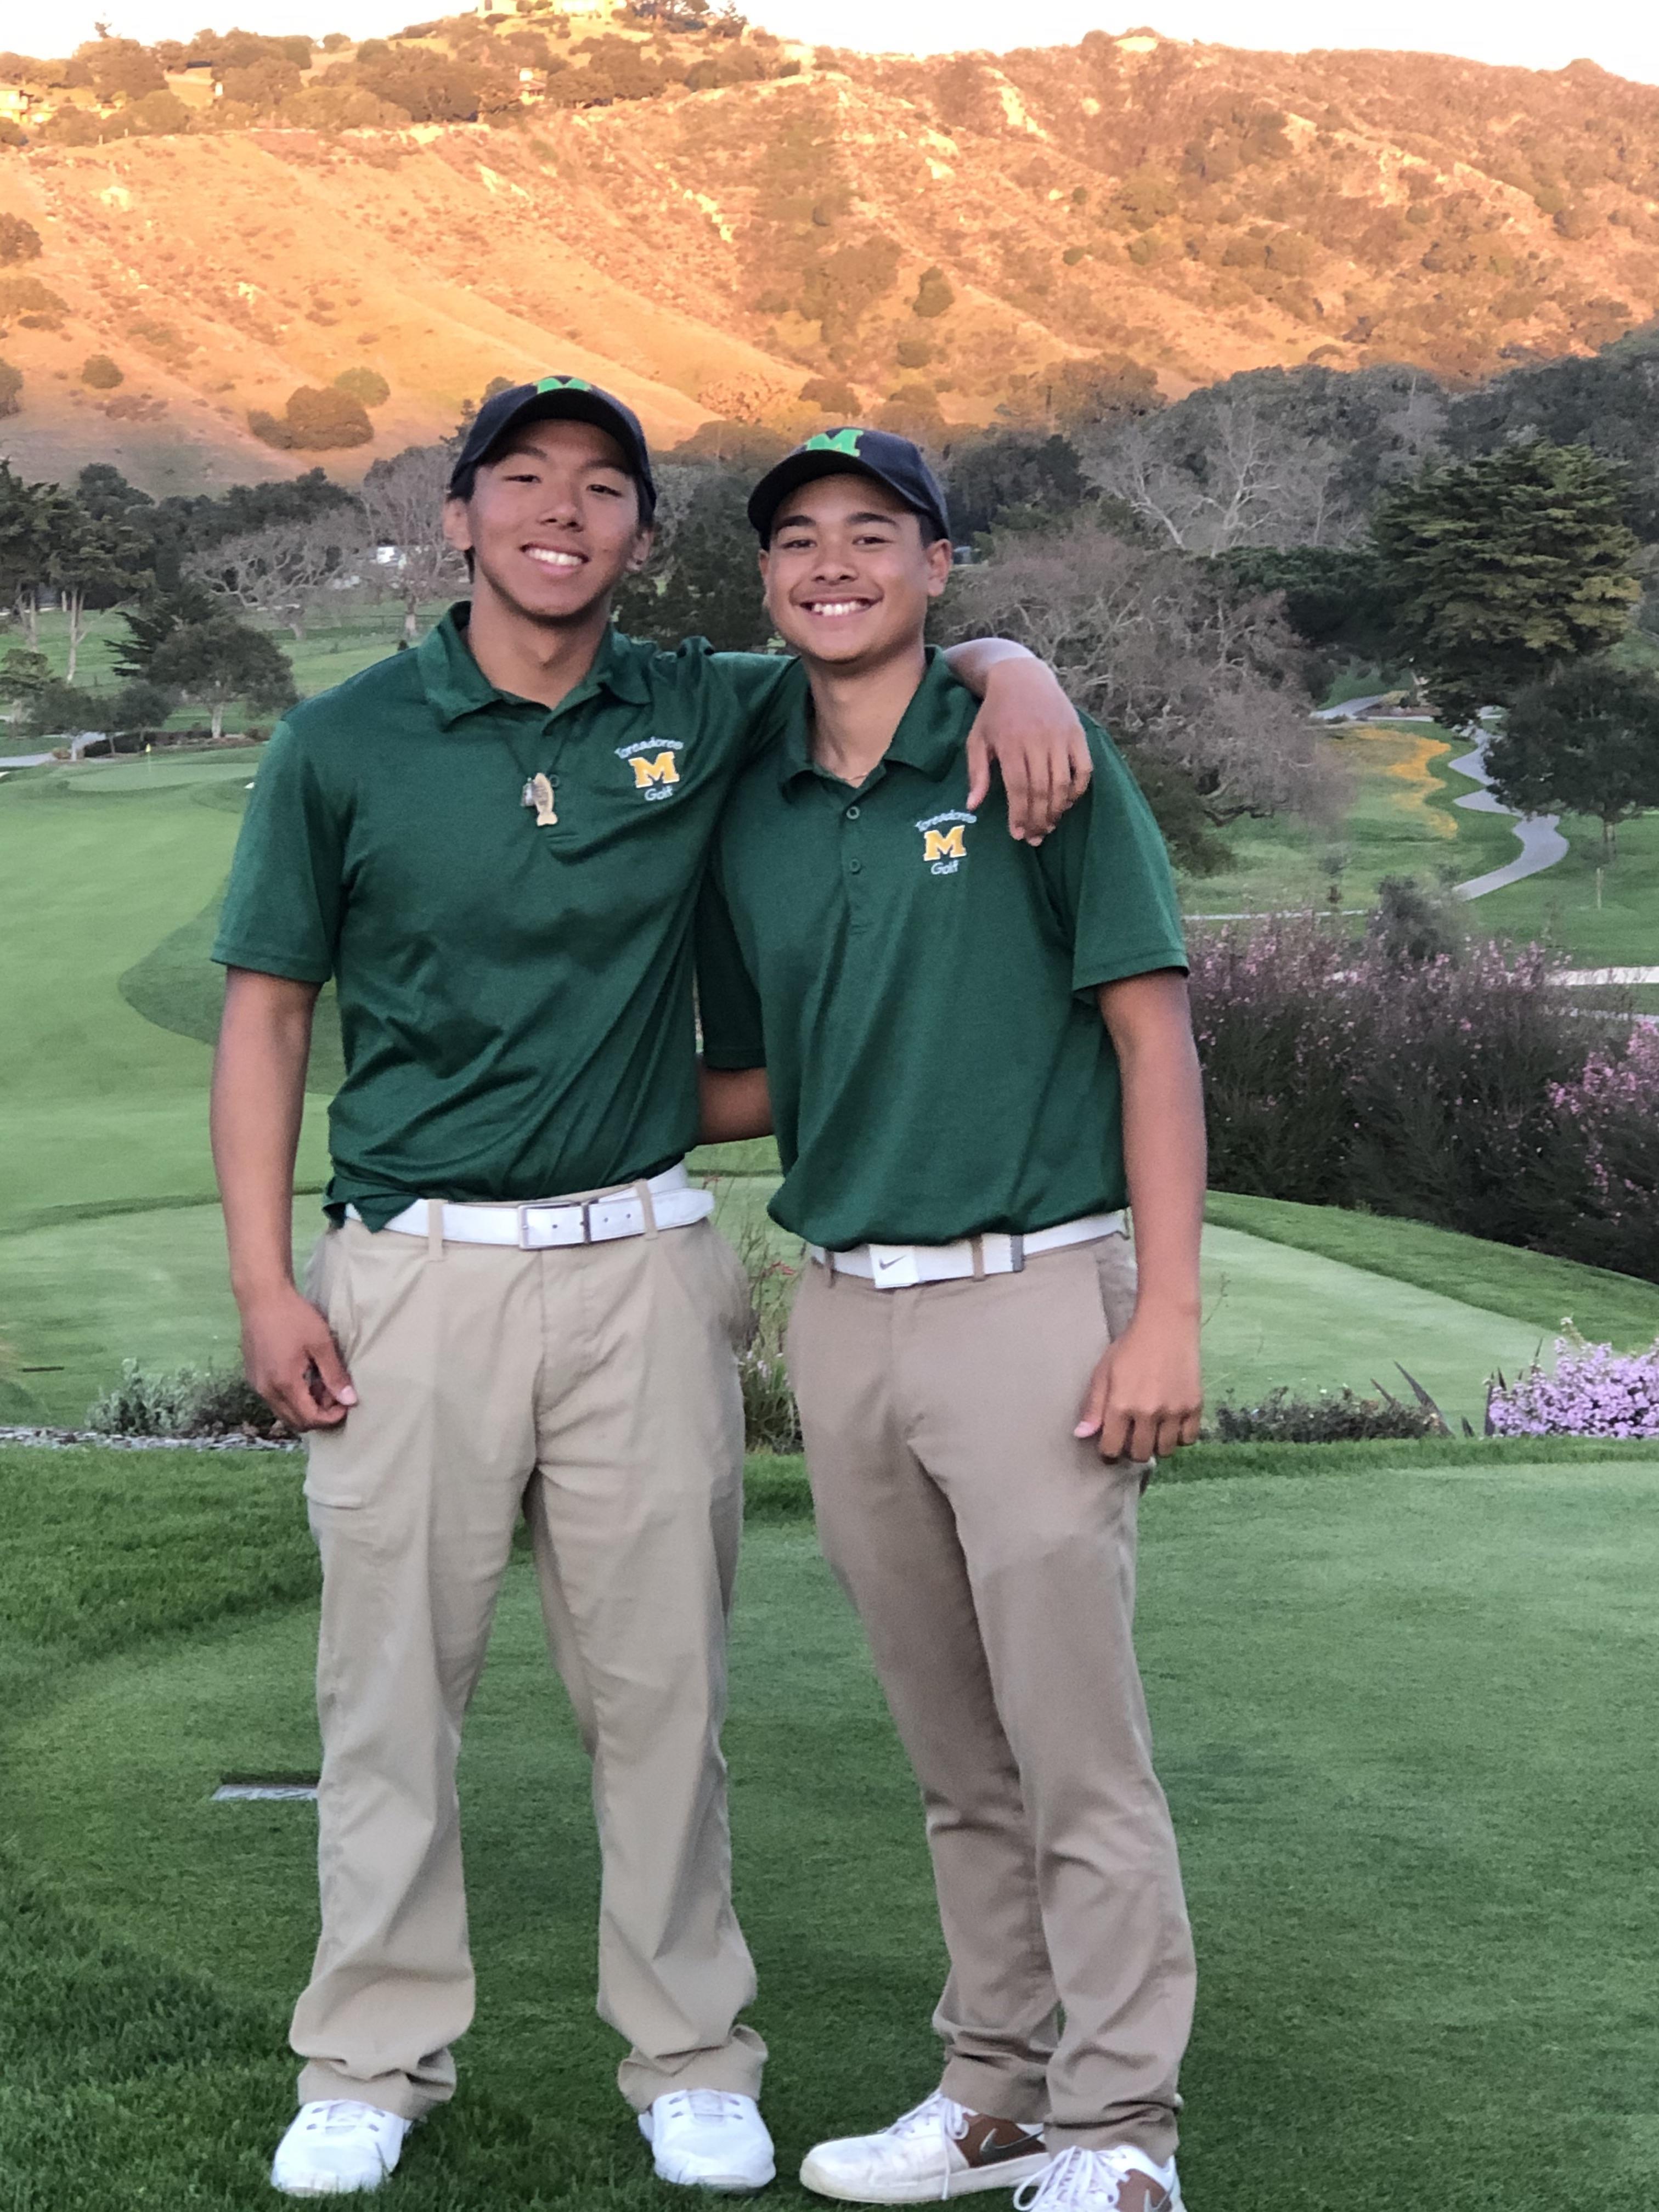 Golf Photo (2 players)